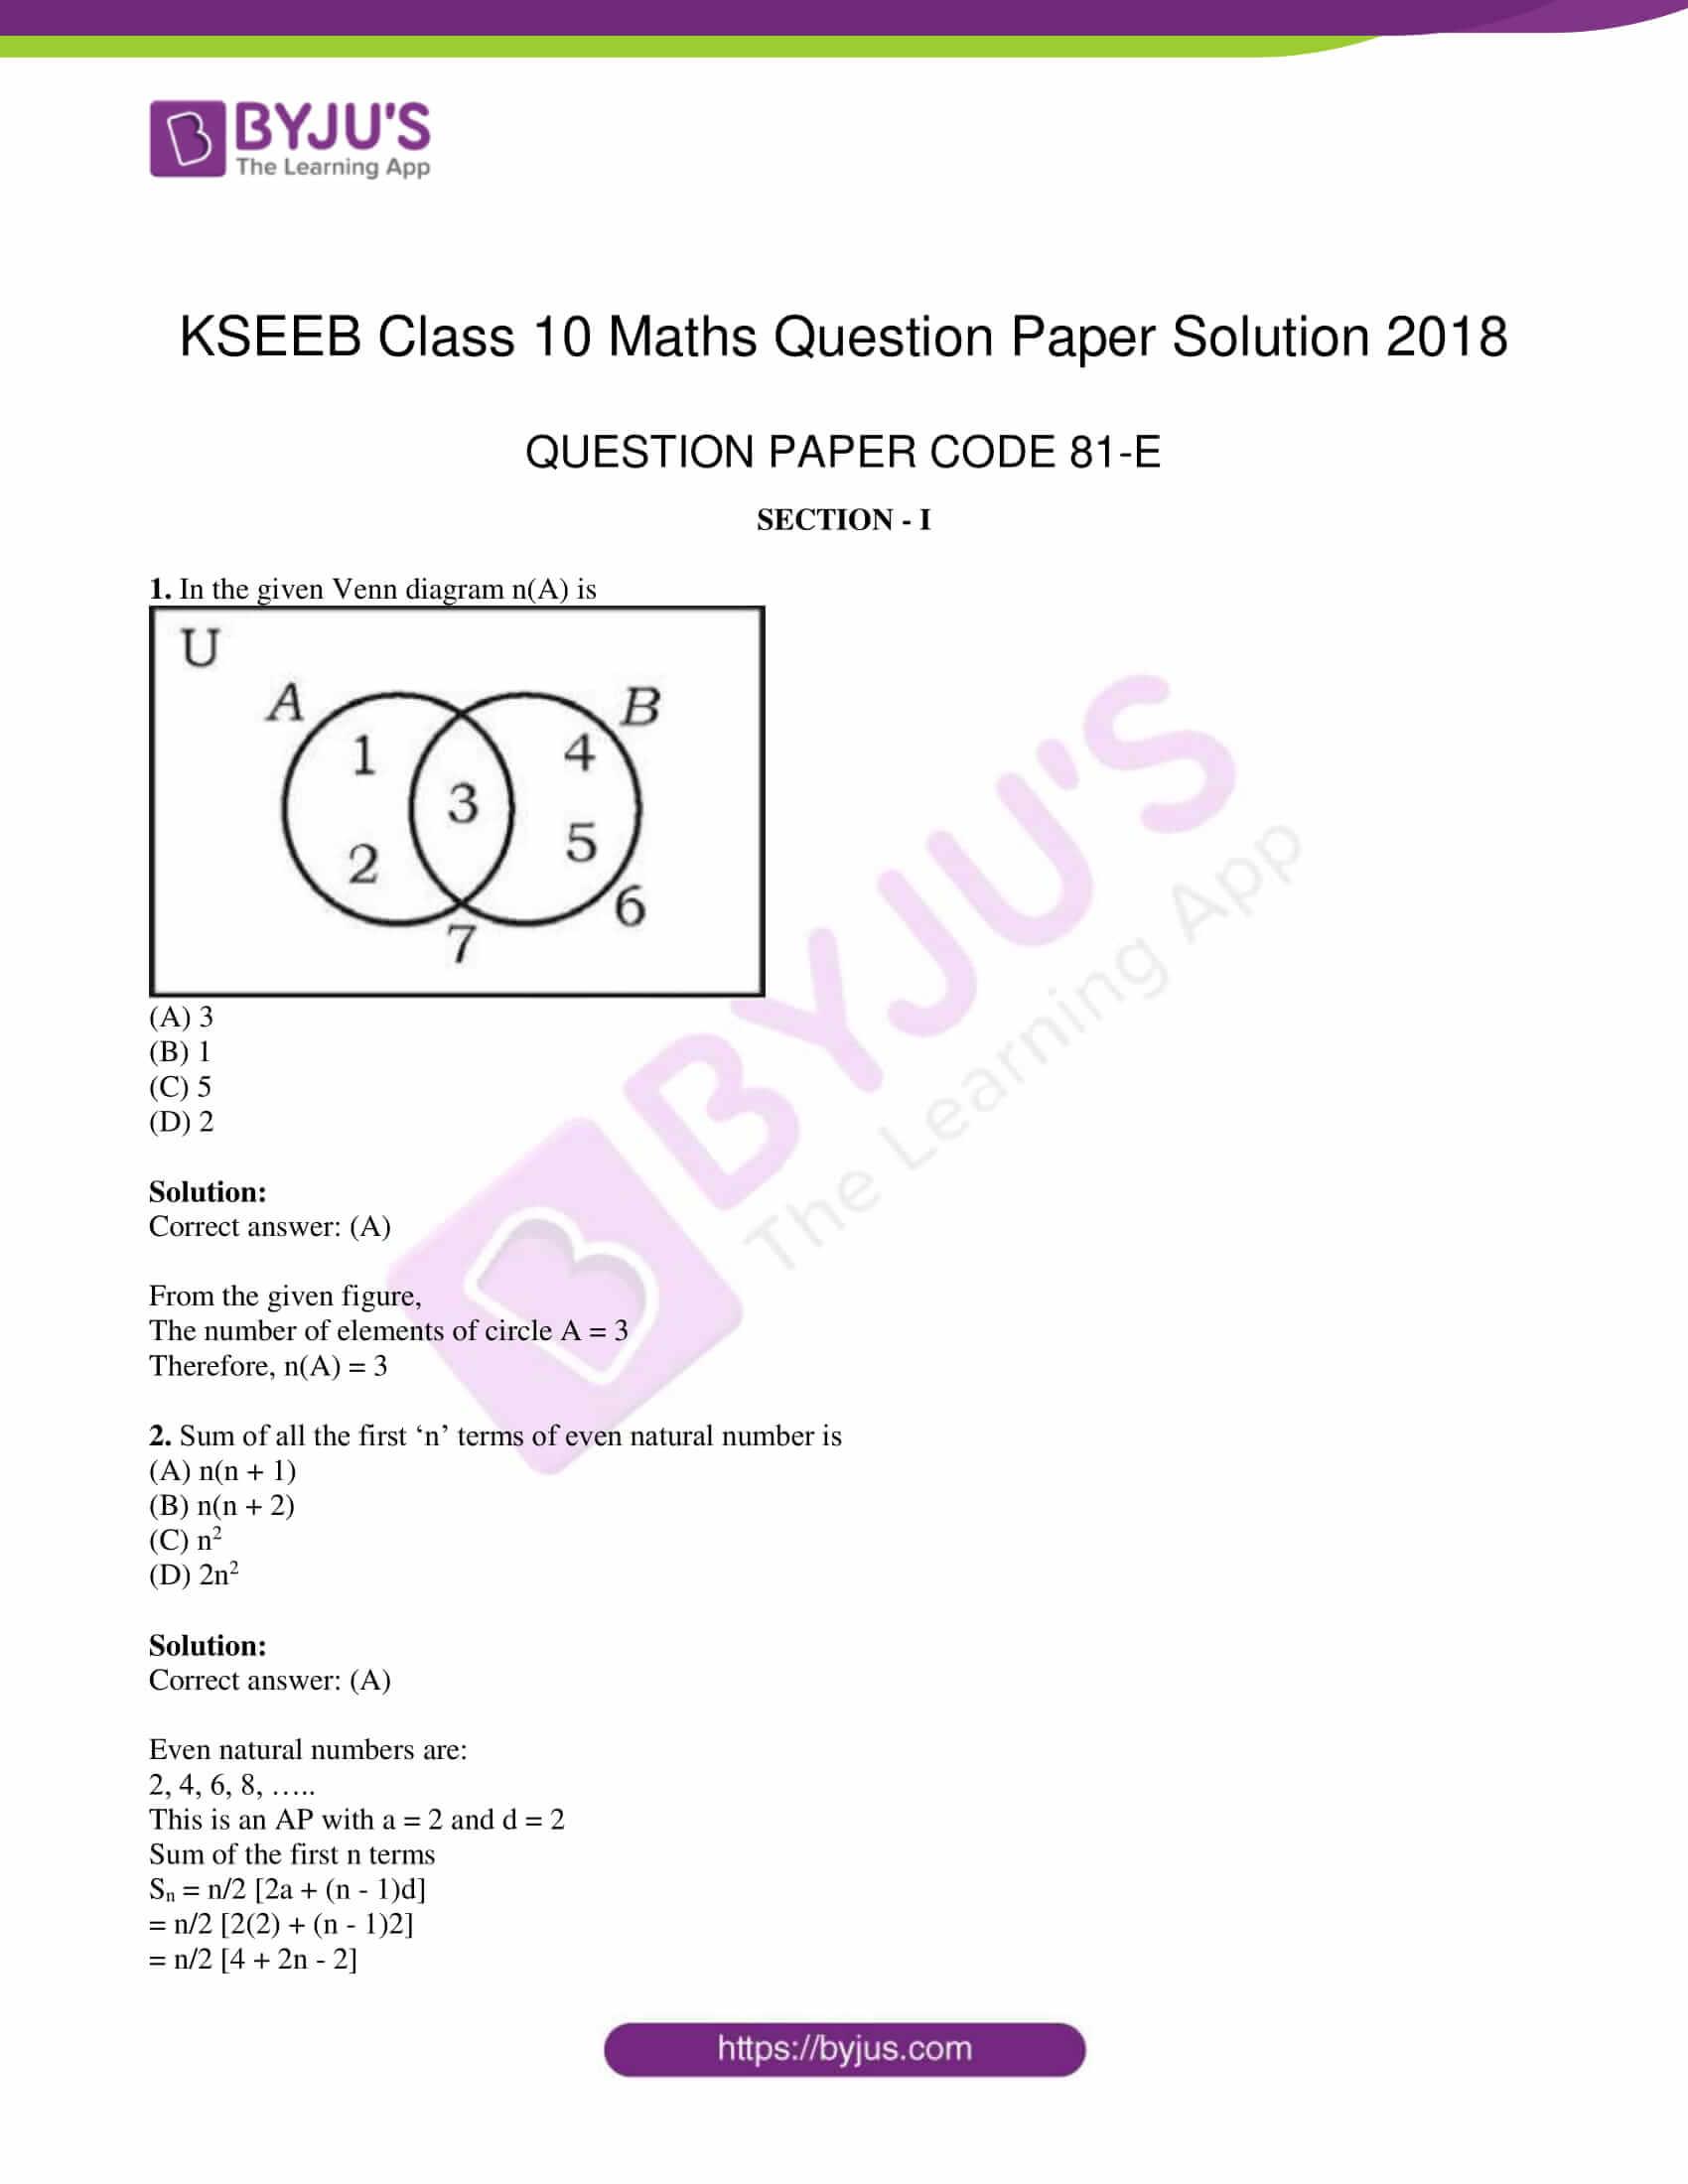 kseeb class 10 maths question paper solution 2018 01